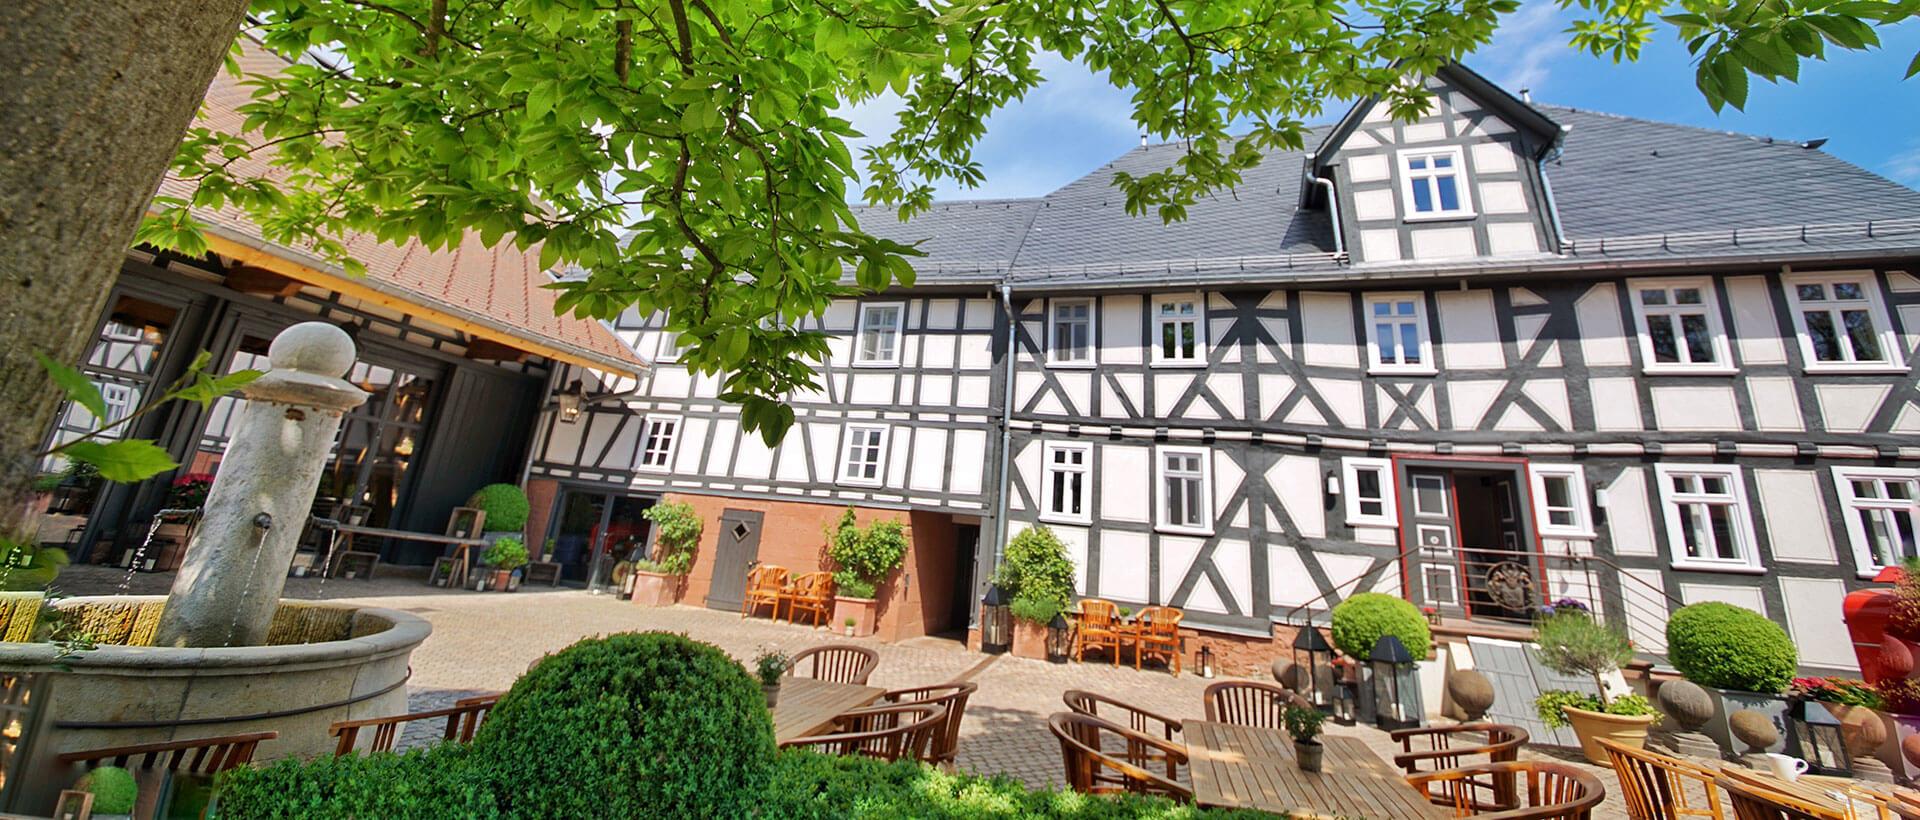 Die Pension Schlafgut in Dagobertshausen nahe Marburg